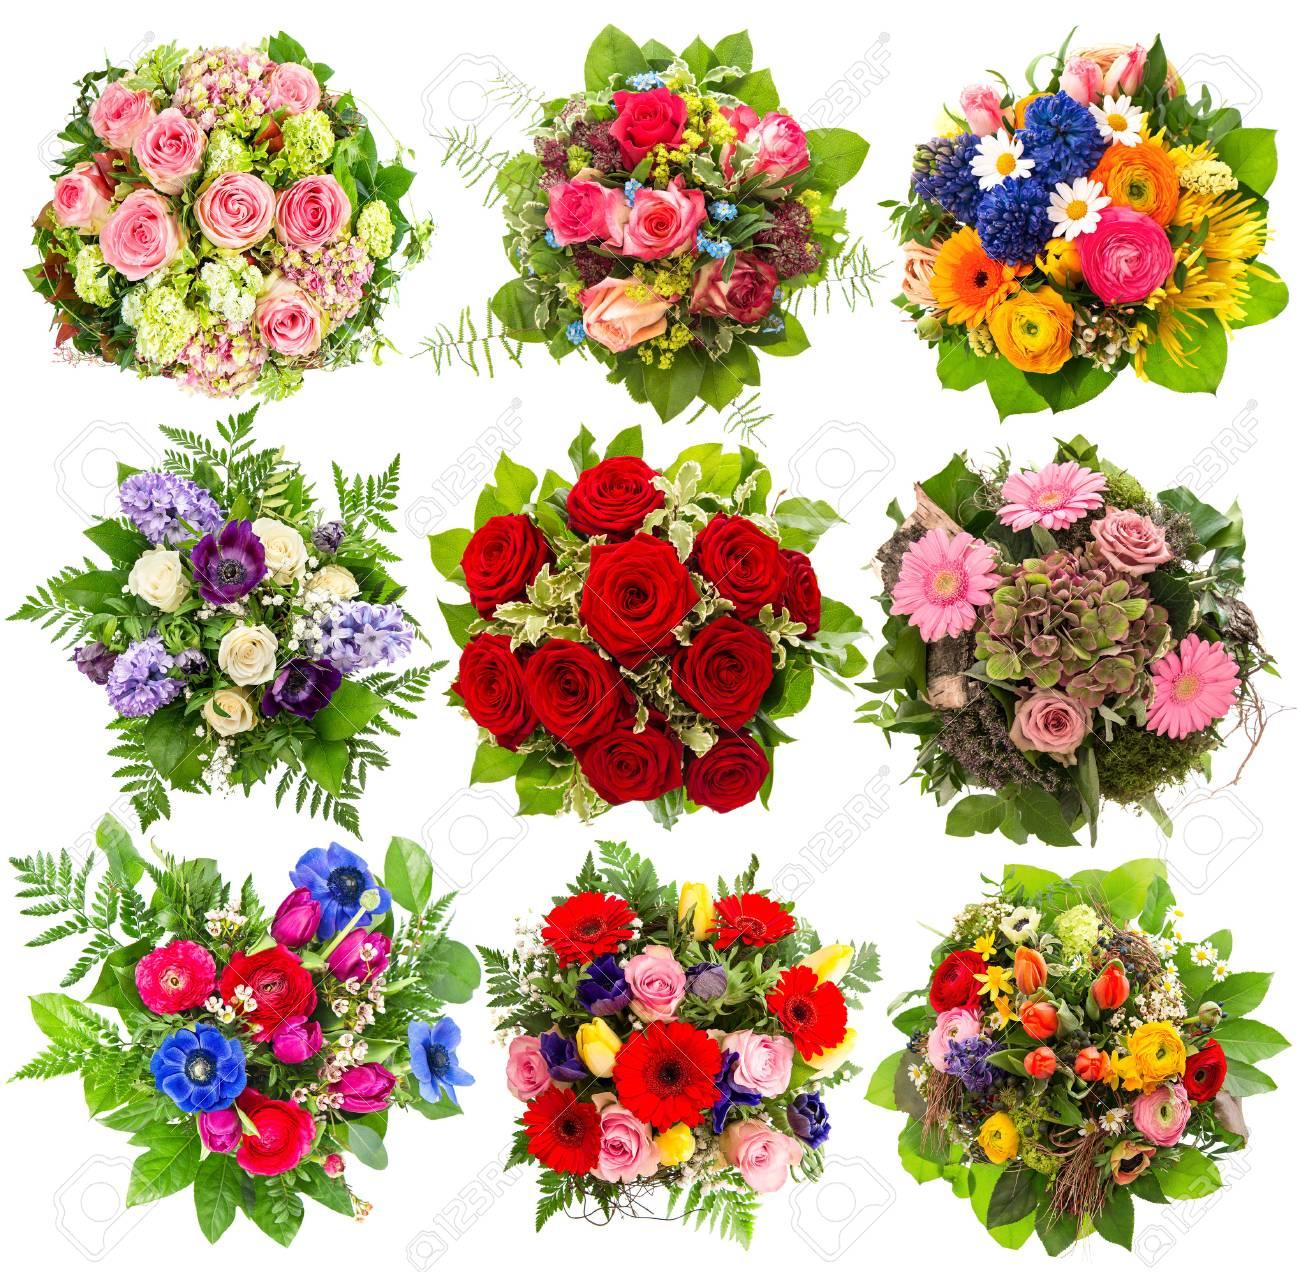 Nine colorful flowers bouquet for birthday wedding mothers stock nine colorful flowers bouquet for birthday wedding mothers day easter anniversary izmirmasajfo